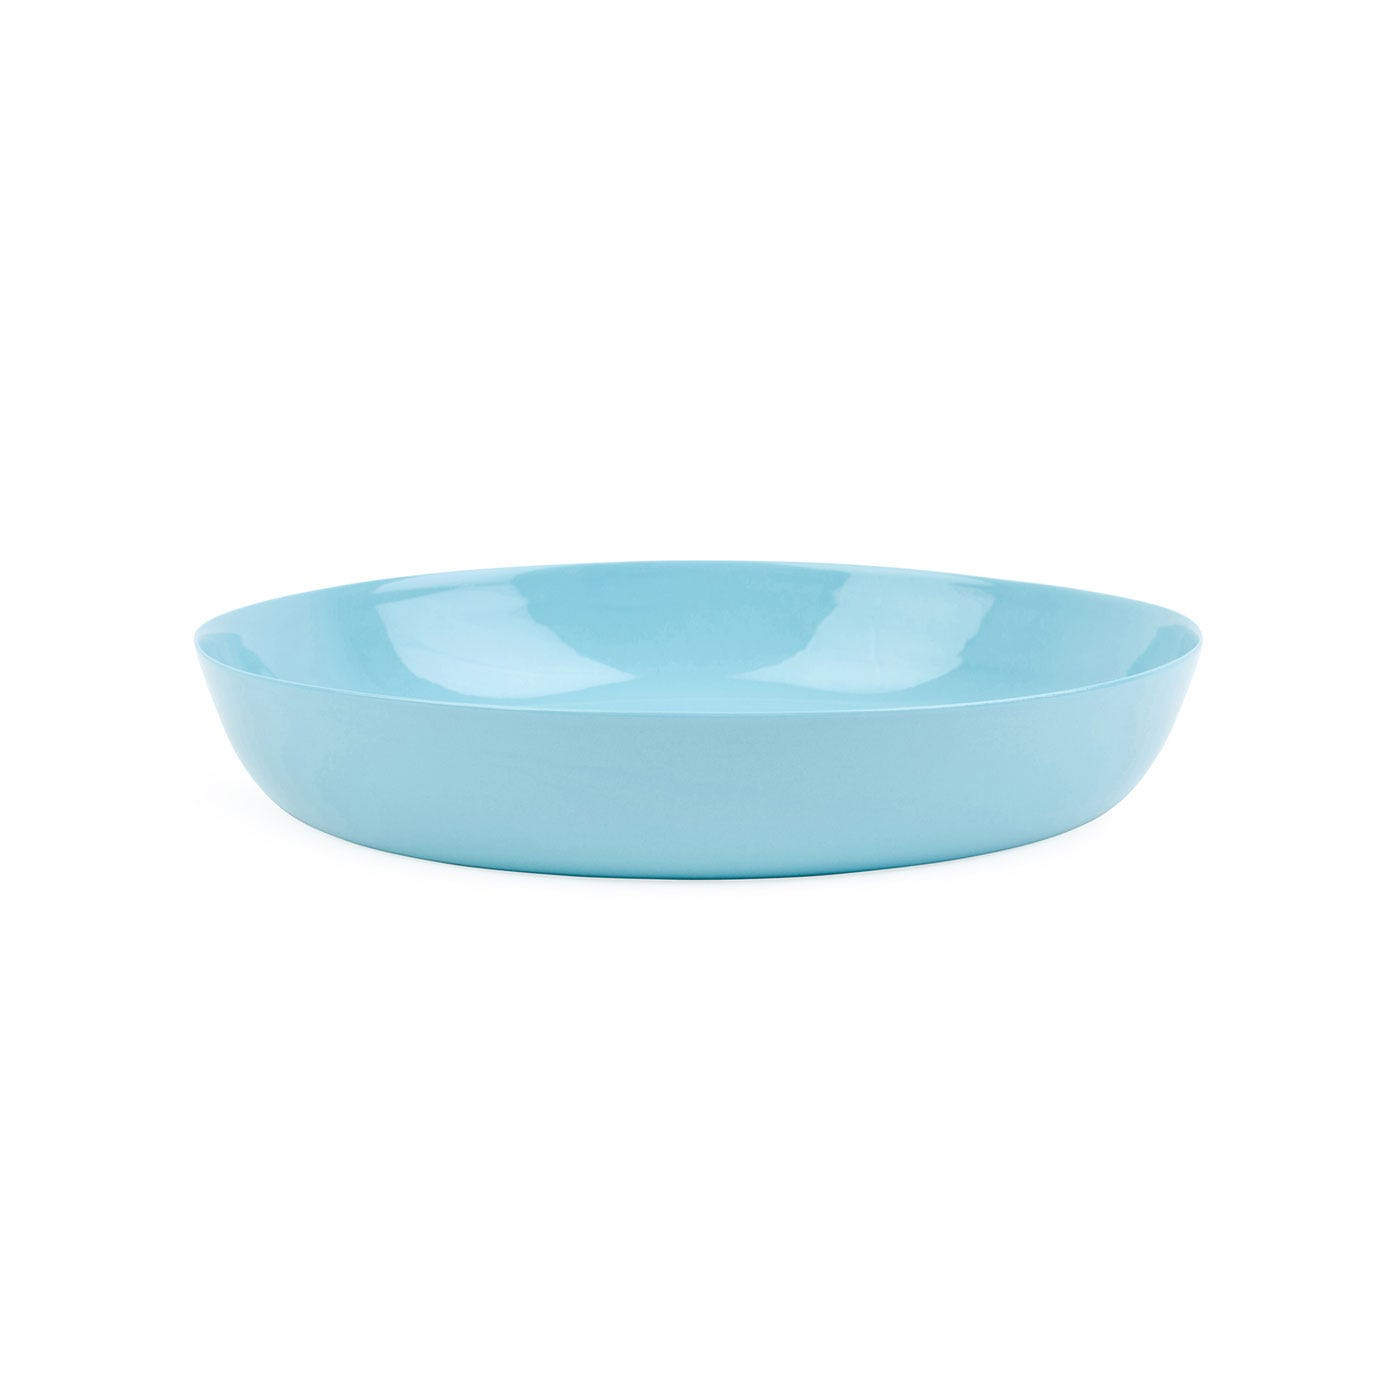 Porcelain Turquoise Pasta Bowl